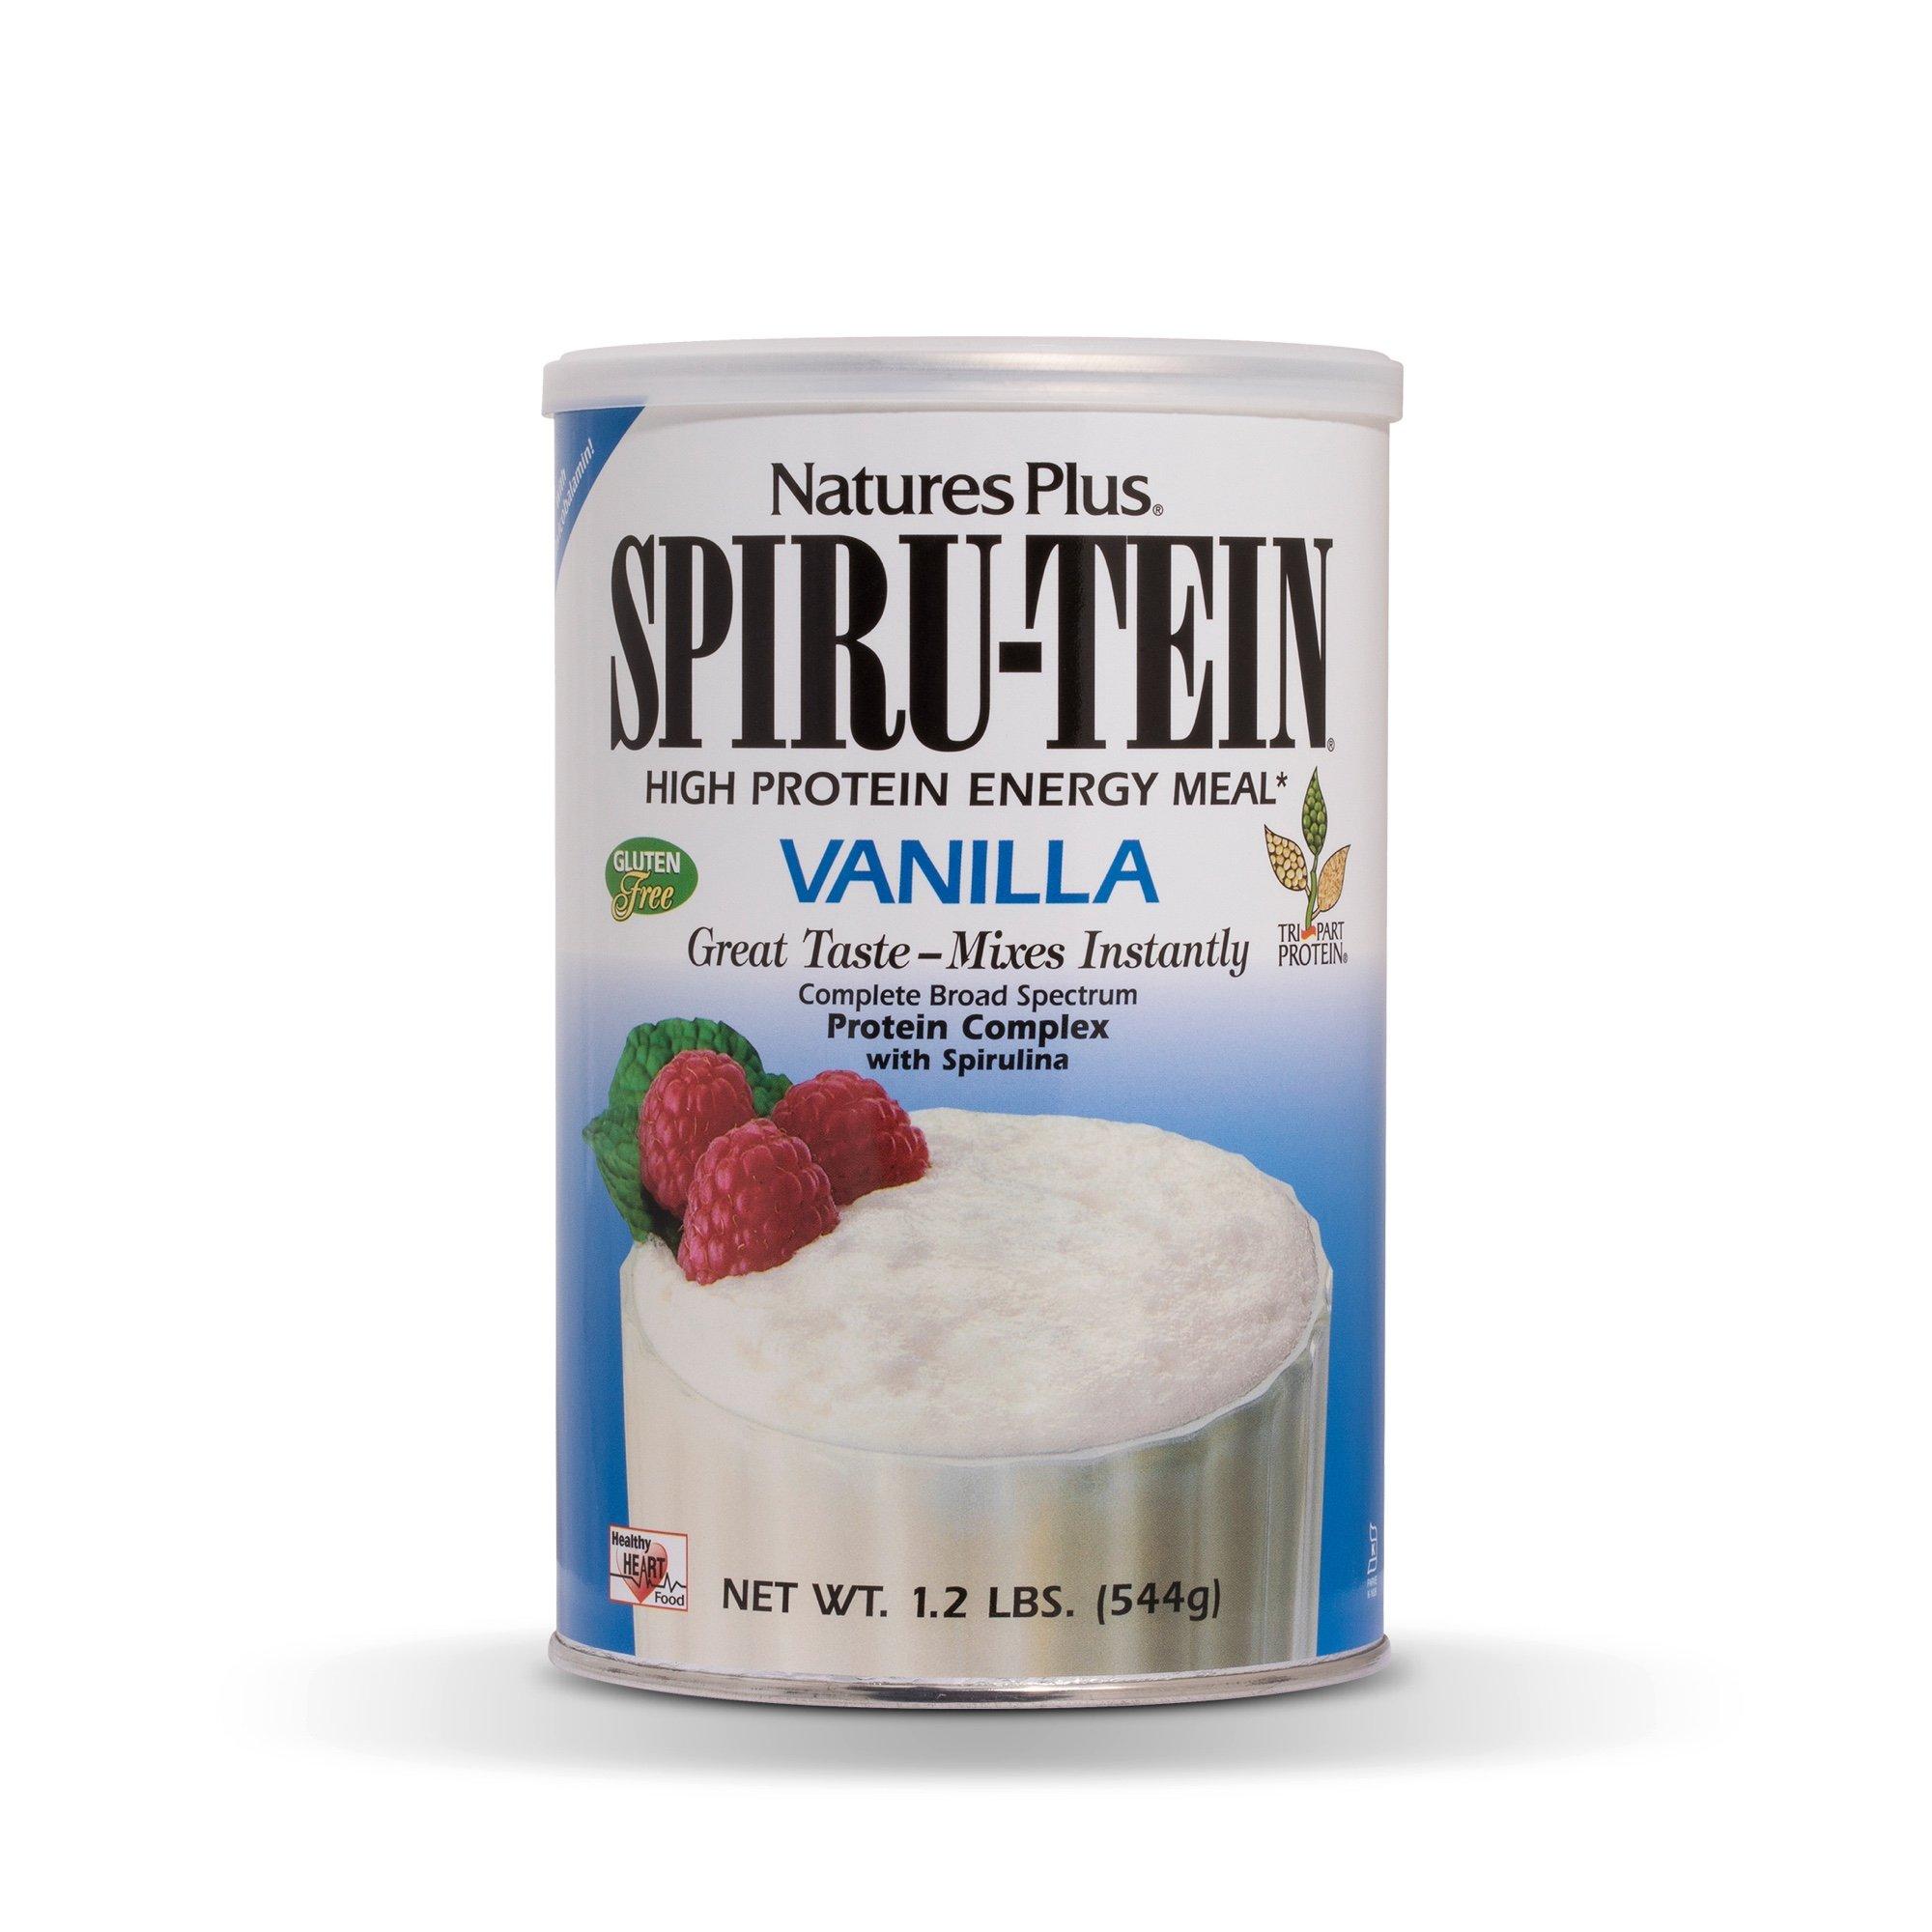 NaturesPlus SPIRU-TEIN Shake - Vanilla - 1.2 lbs, Spirulina Protein Powder - Plant Based Meal Replacement, Vitamins & Minerals For Energy - Vegetarian, Gluten-Free - 16 Servings by Nature's Plus